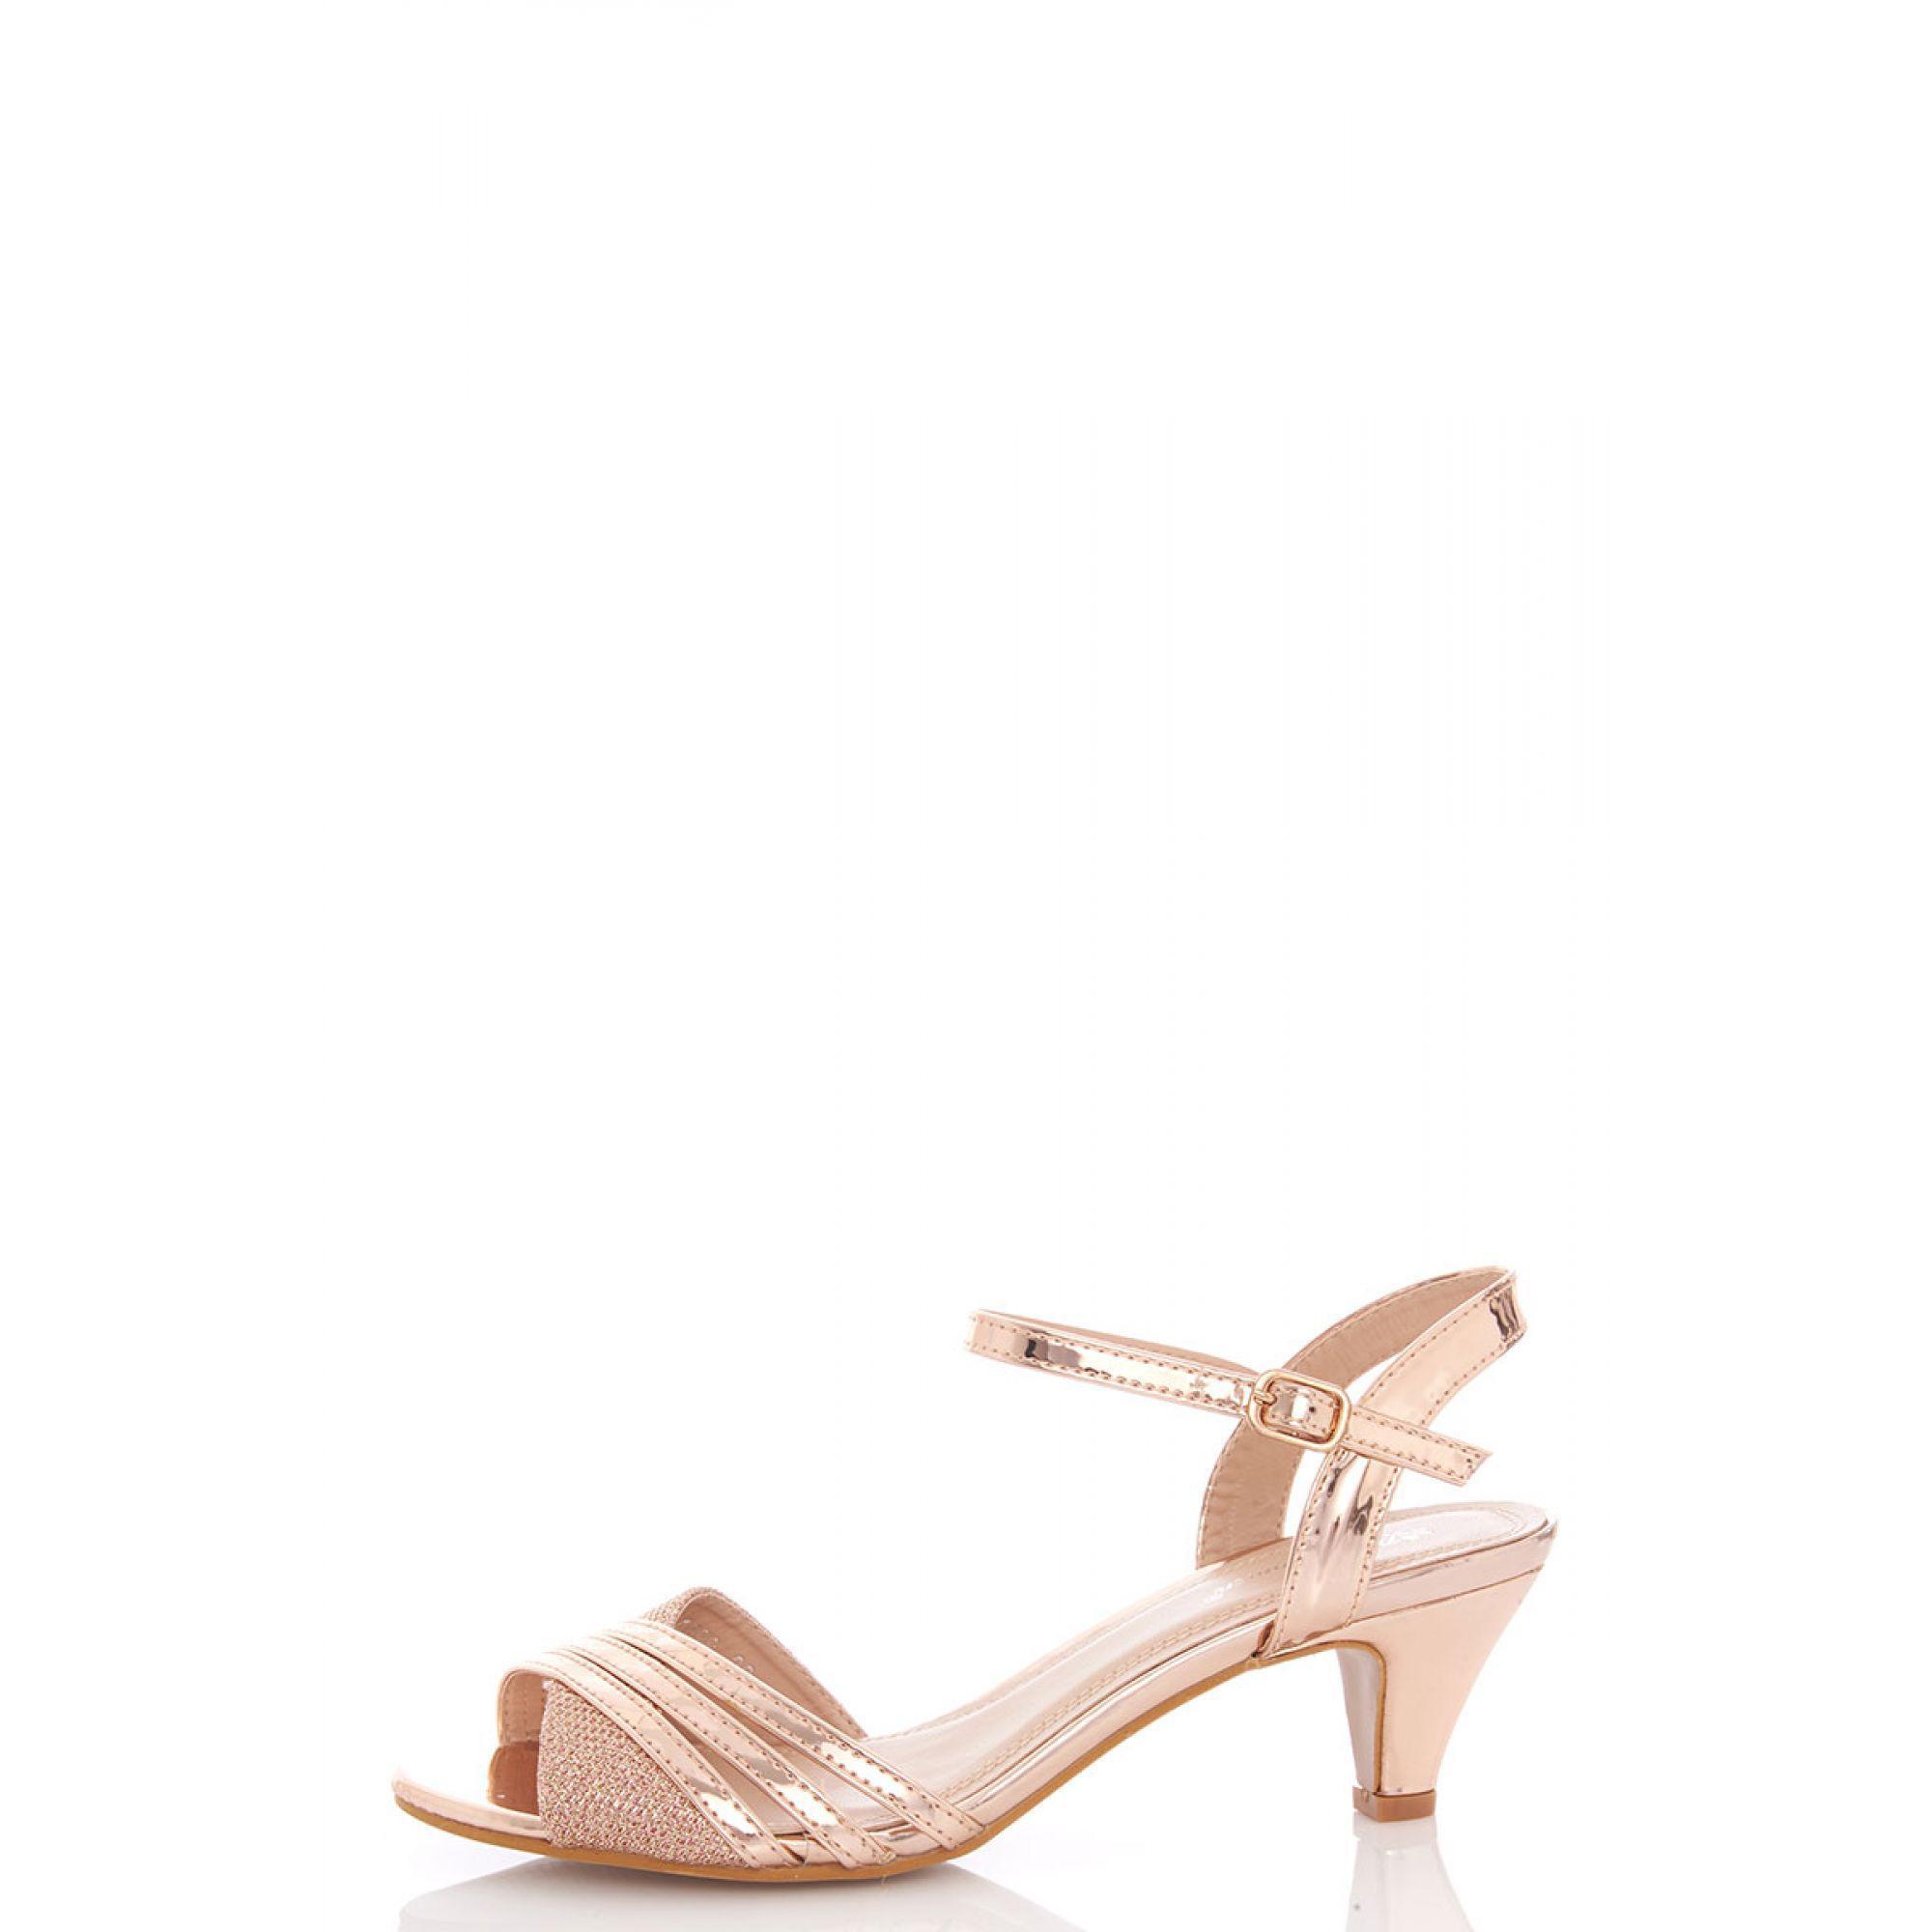 53b362dd766 Quiz - Rose Gold Metallic Strap Low Heel Sandals - Lyst. View fullscreen